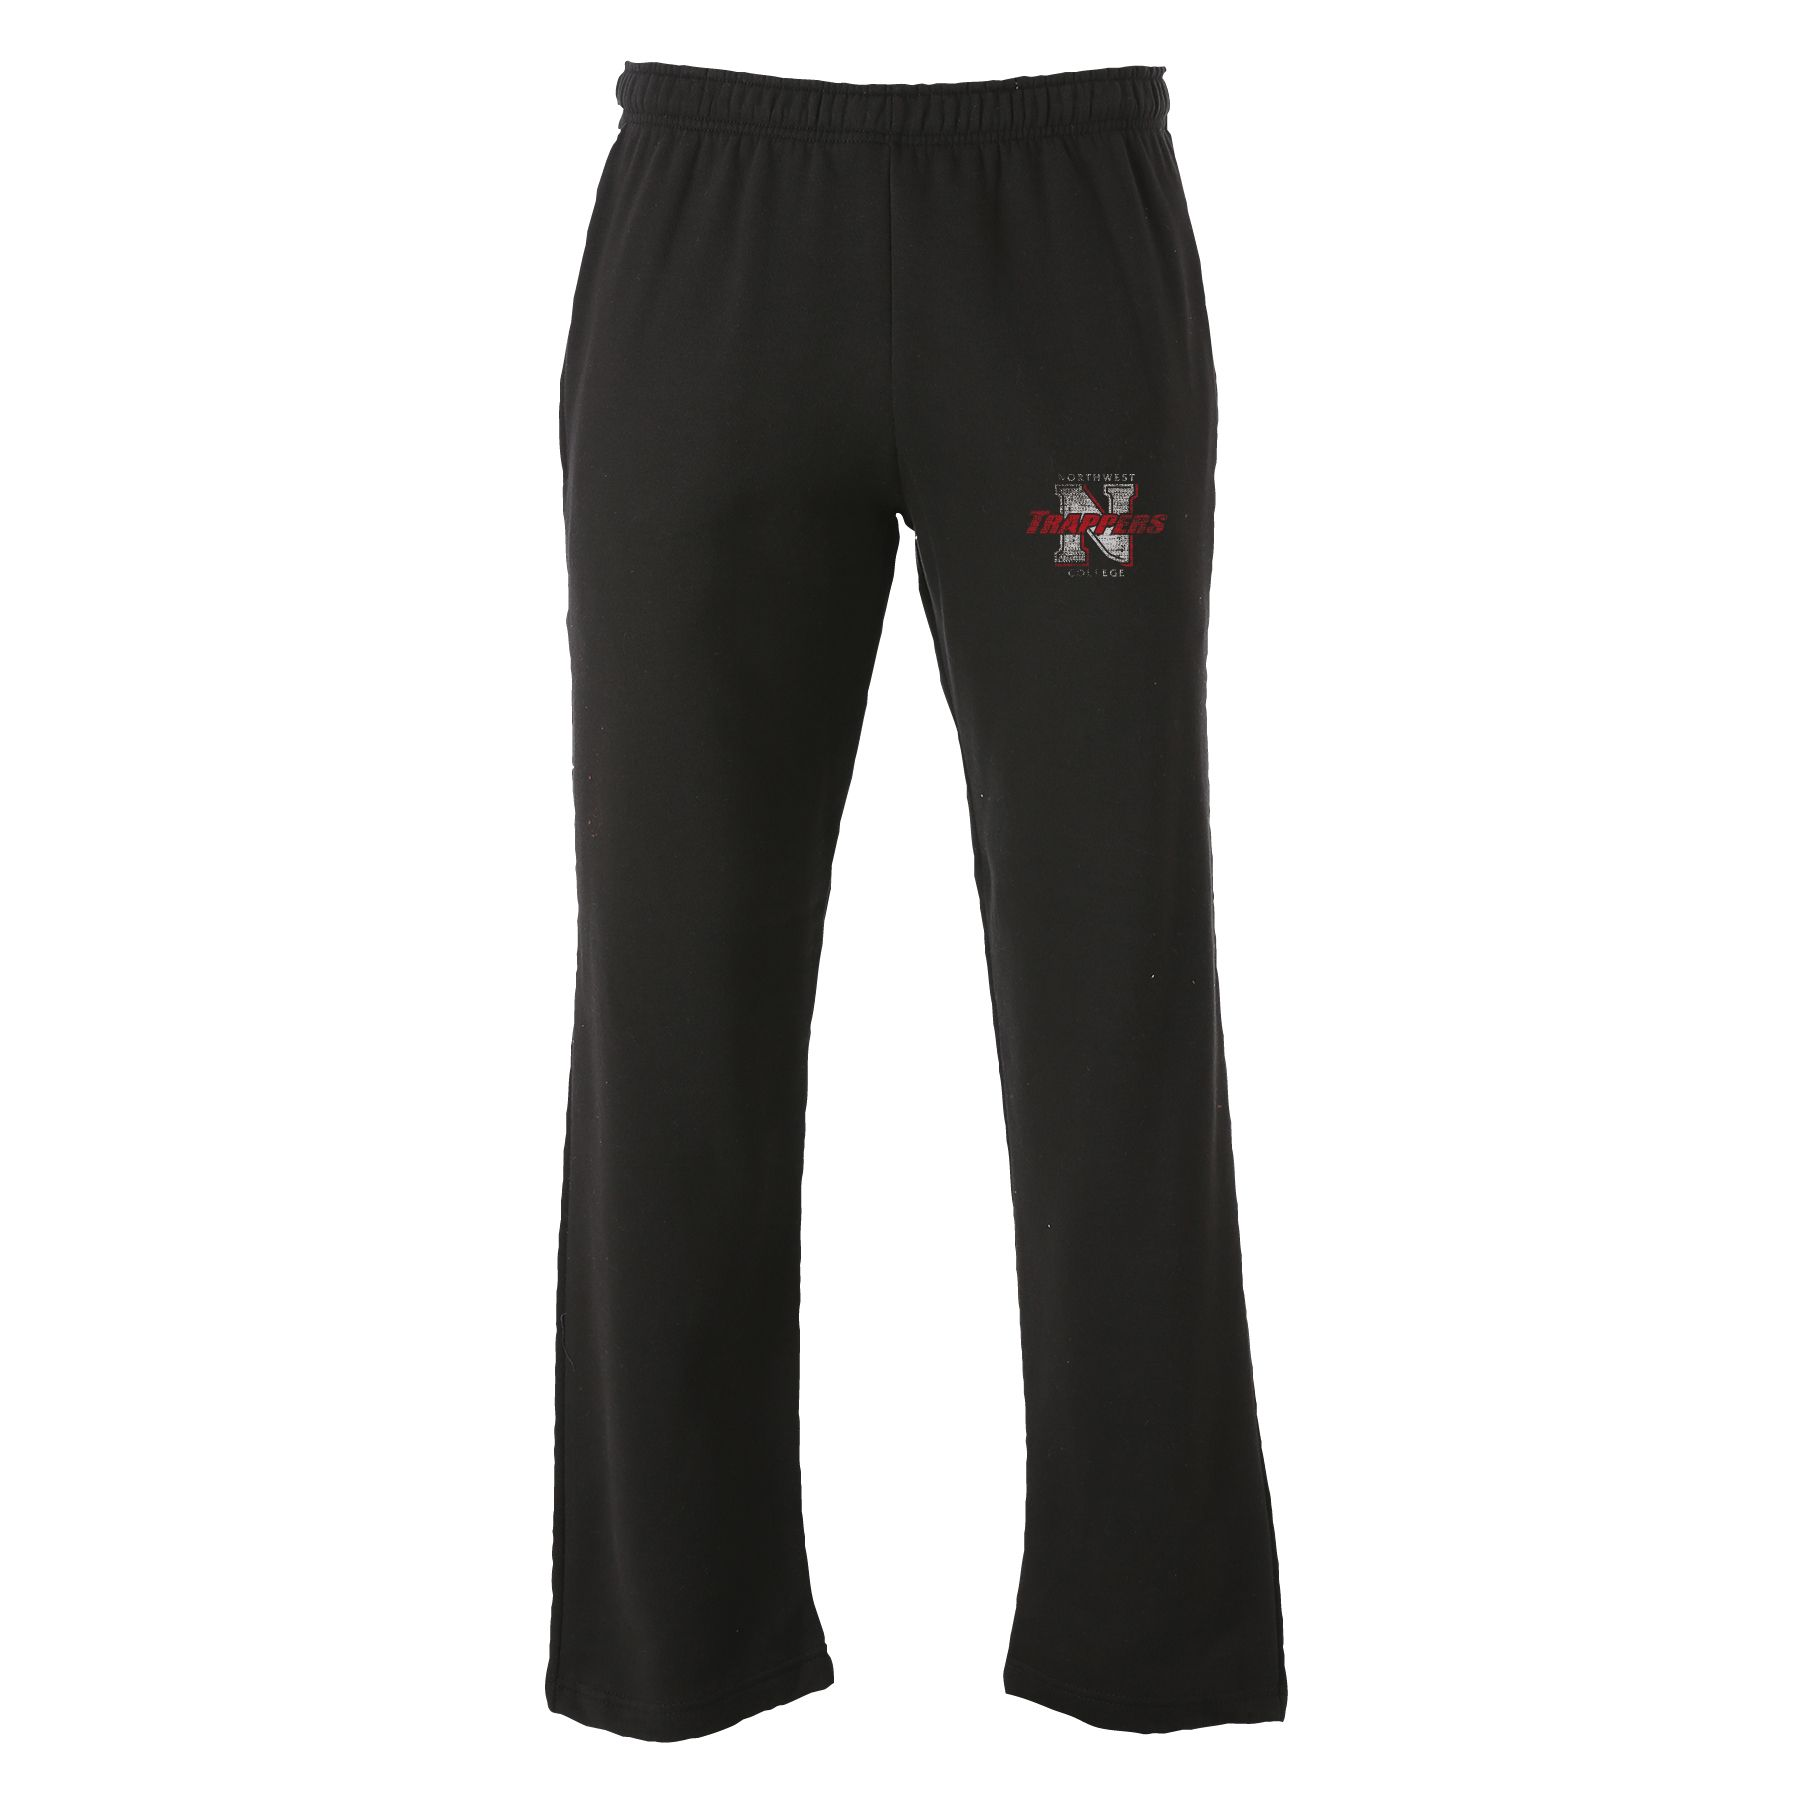 Benchmark Sweatpants